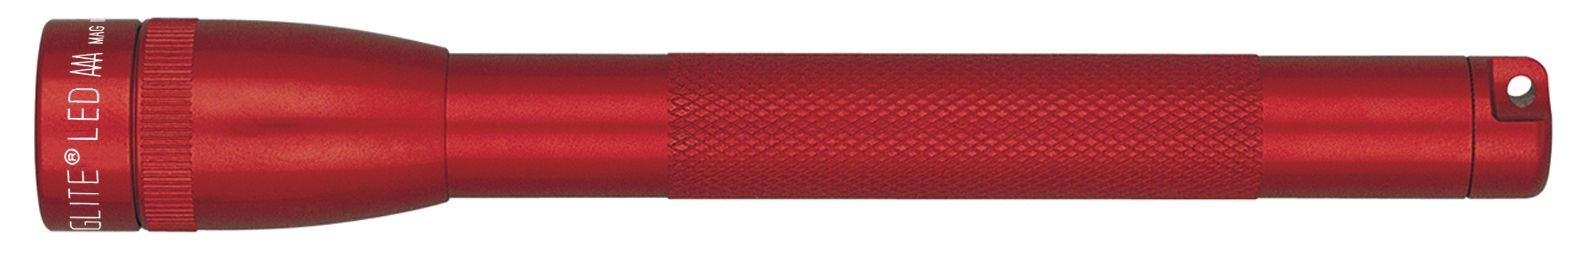 Linterna Maglite : Mag Instruments AAA Mini LED Presentation